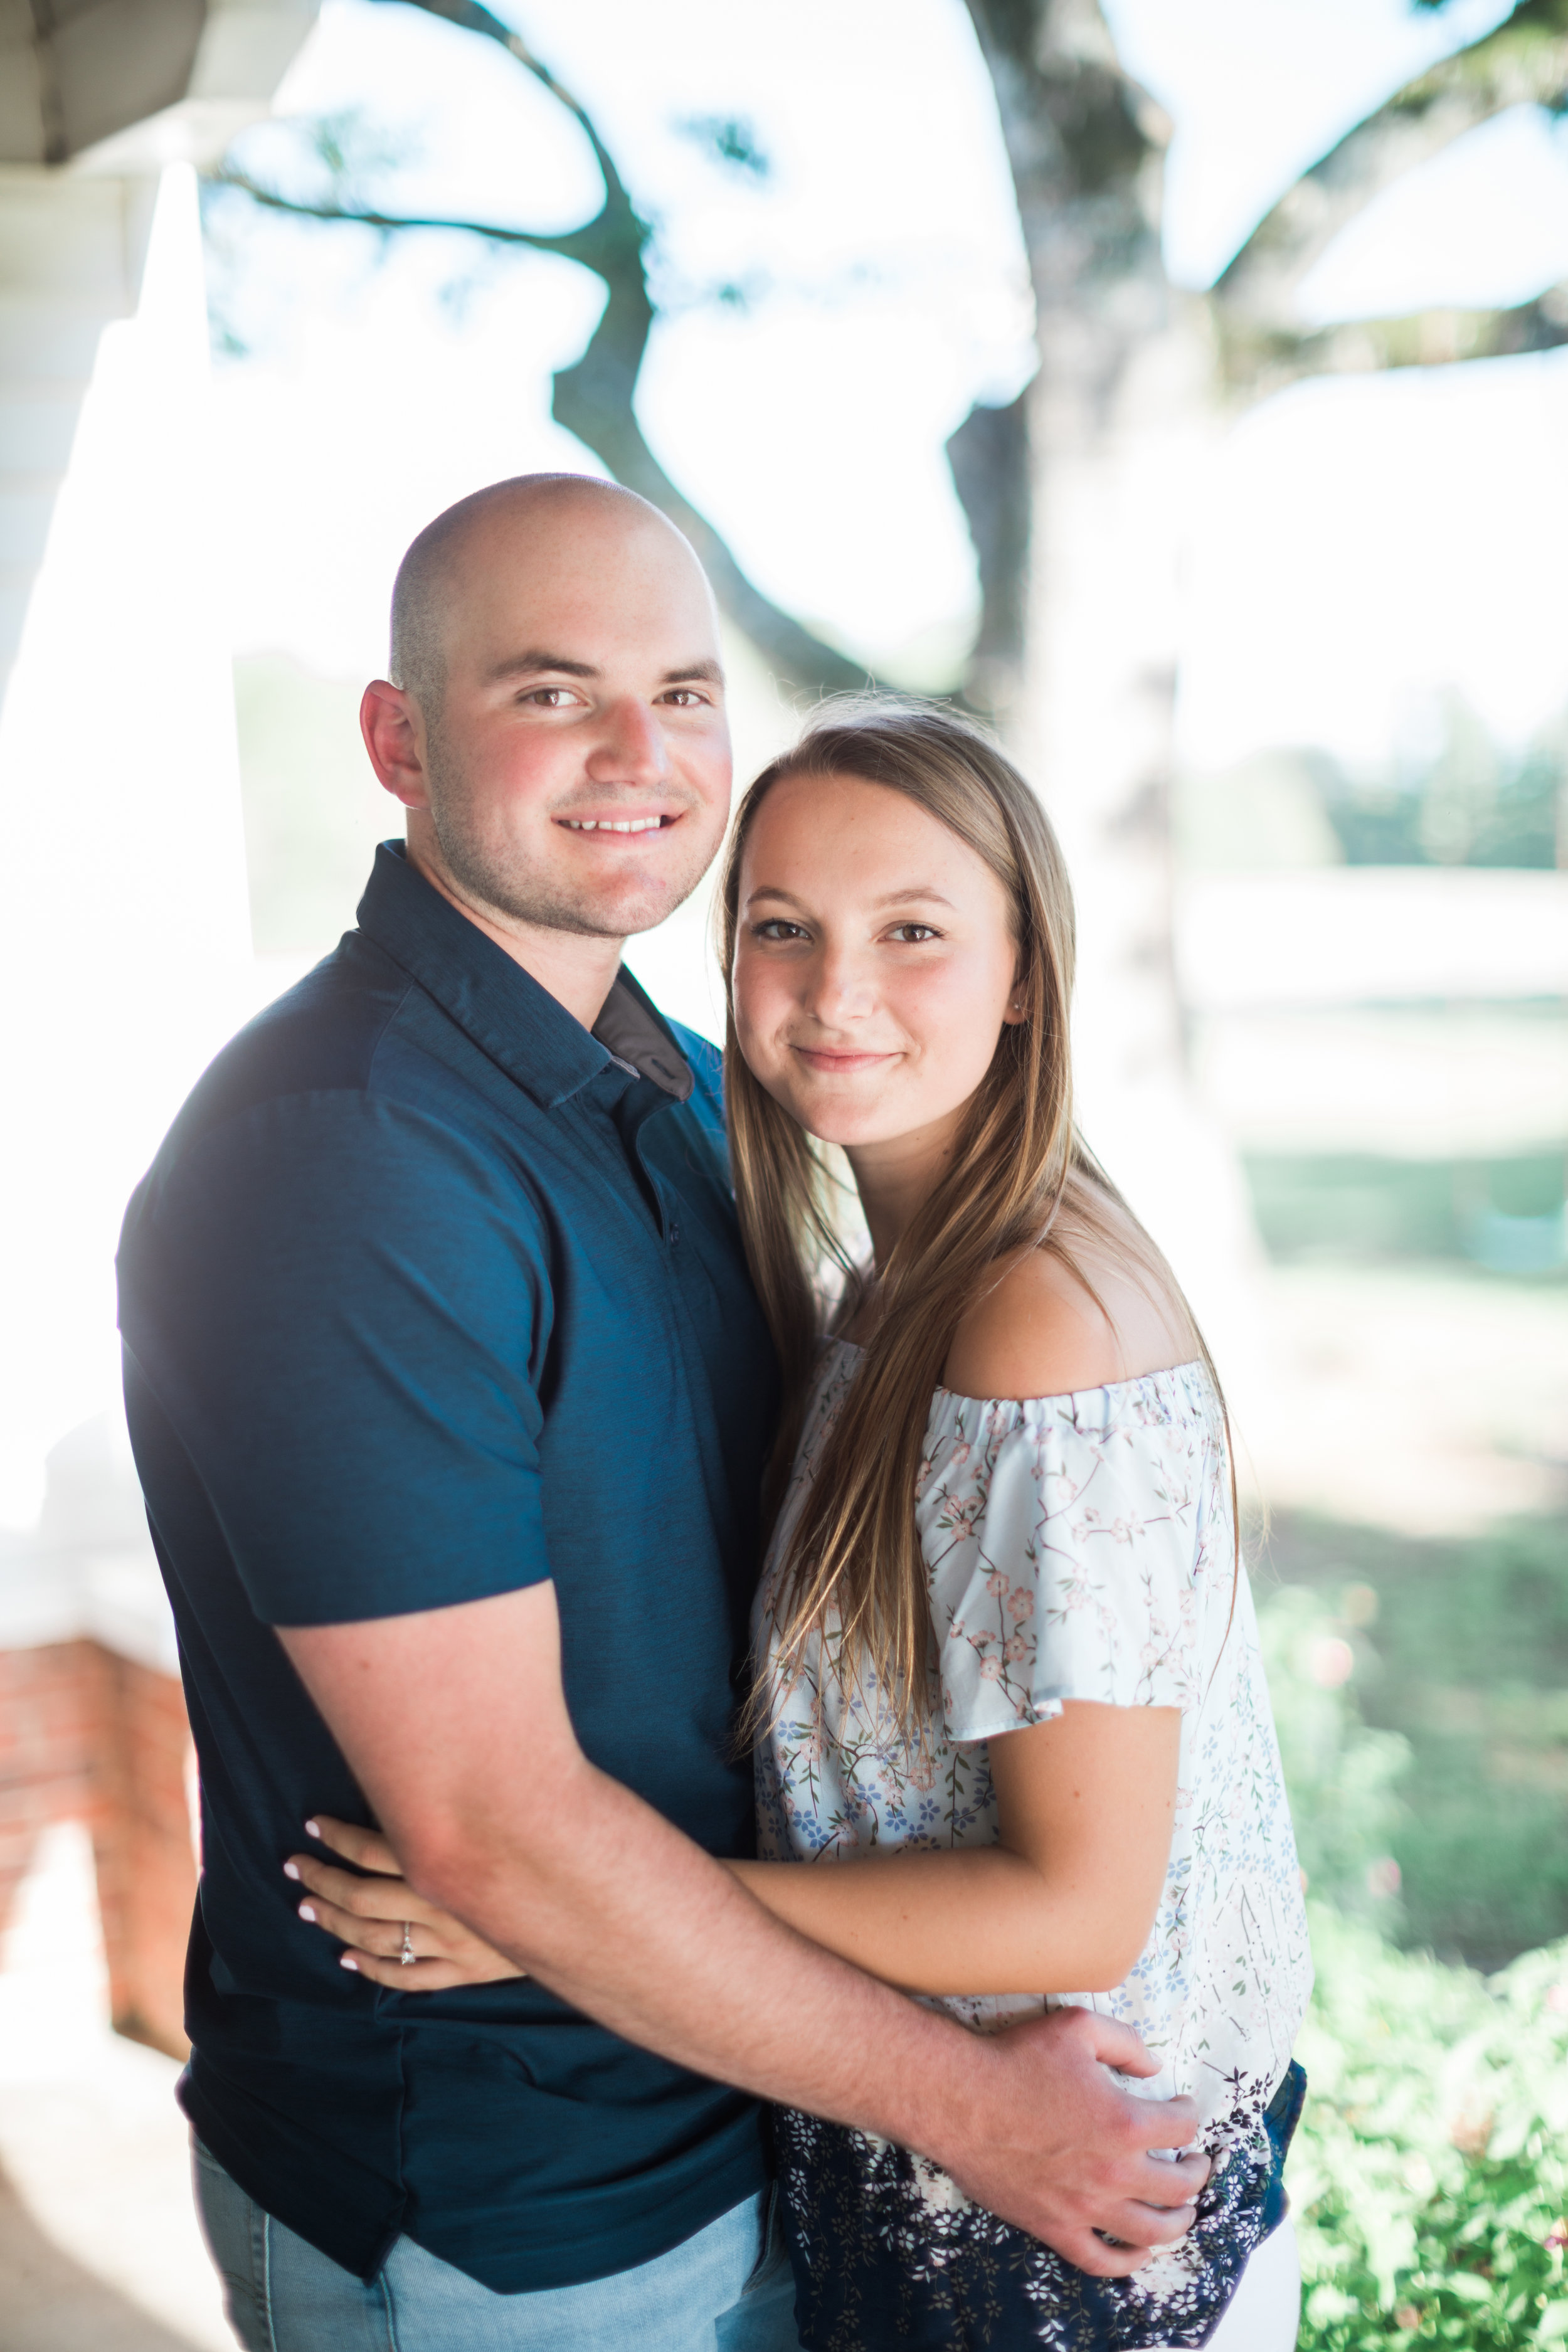 Alabama-Engagement-Photography-Montgomery-Nick-Drollette-Emily and Zakk-107.jpg